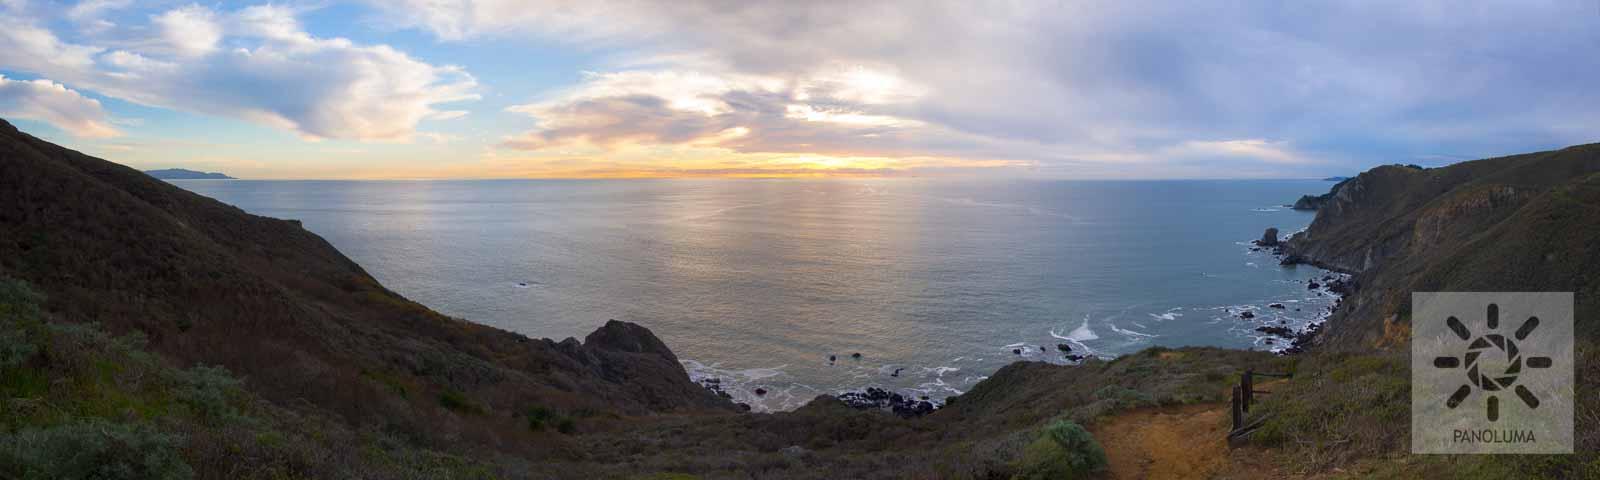 Pirate's Cove, Marin County, California